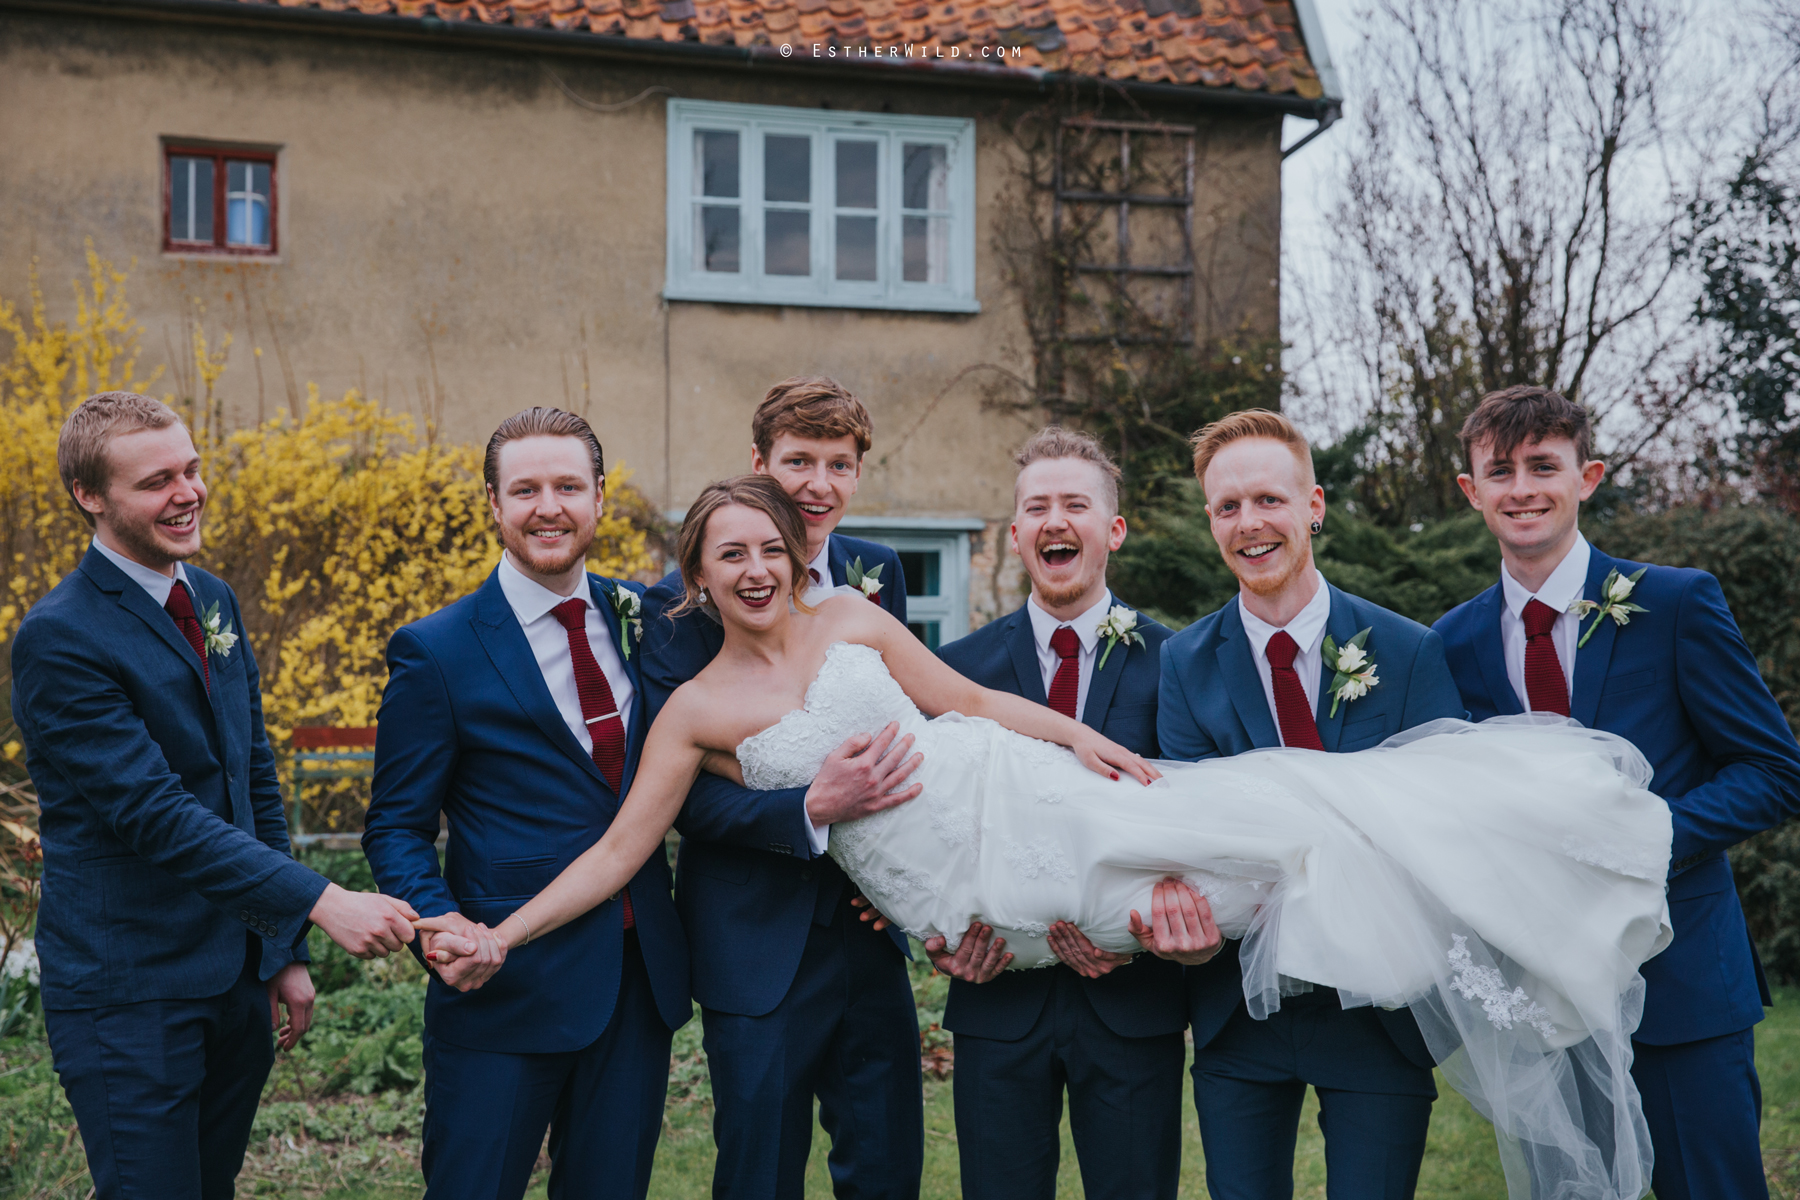 Glebe_Farm_Barn_Rustic_Norfolk_Wedding_Esther_Wild_Photographer_Copyright_IMG_2020.jpg